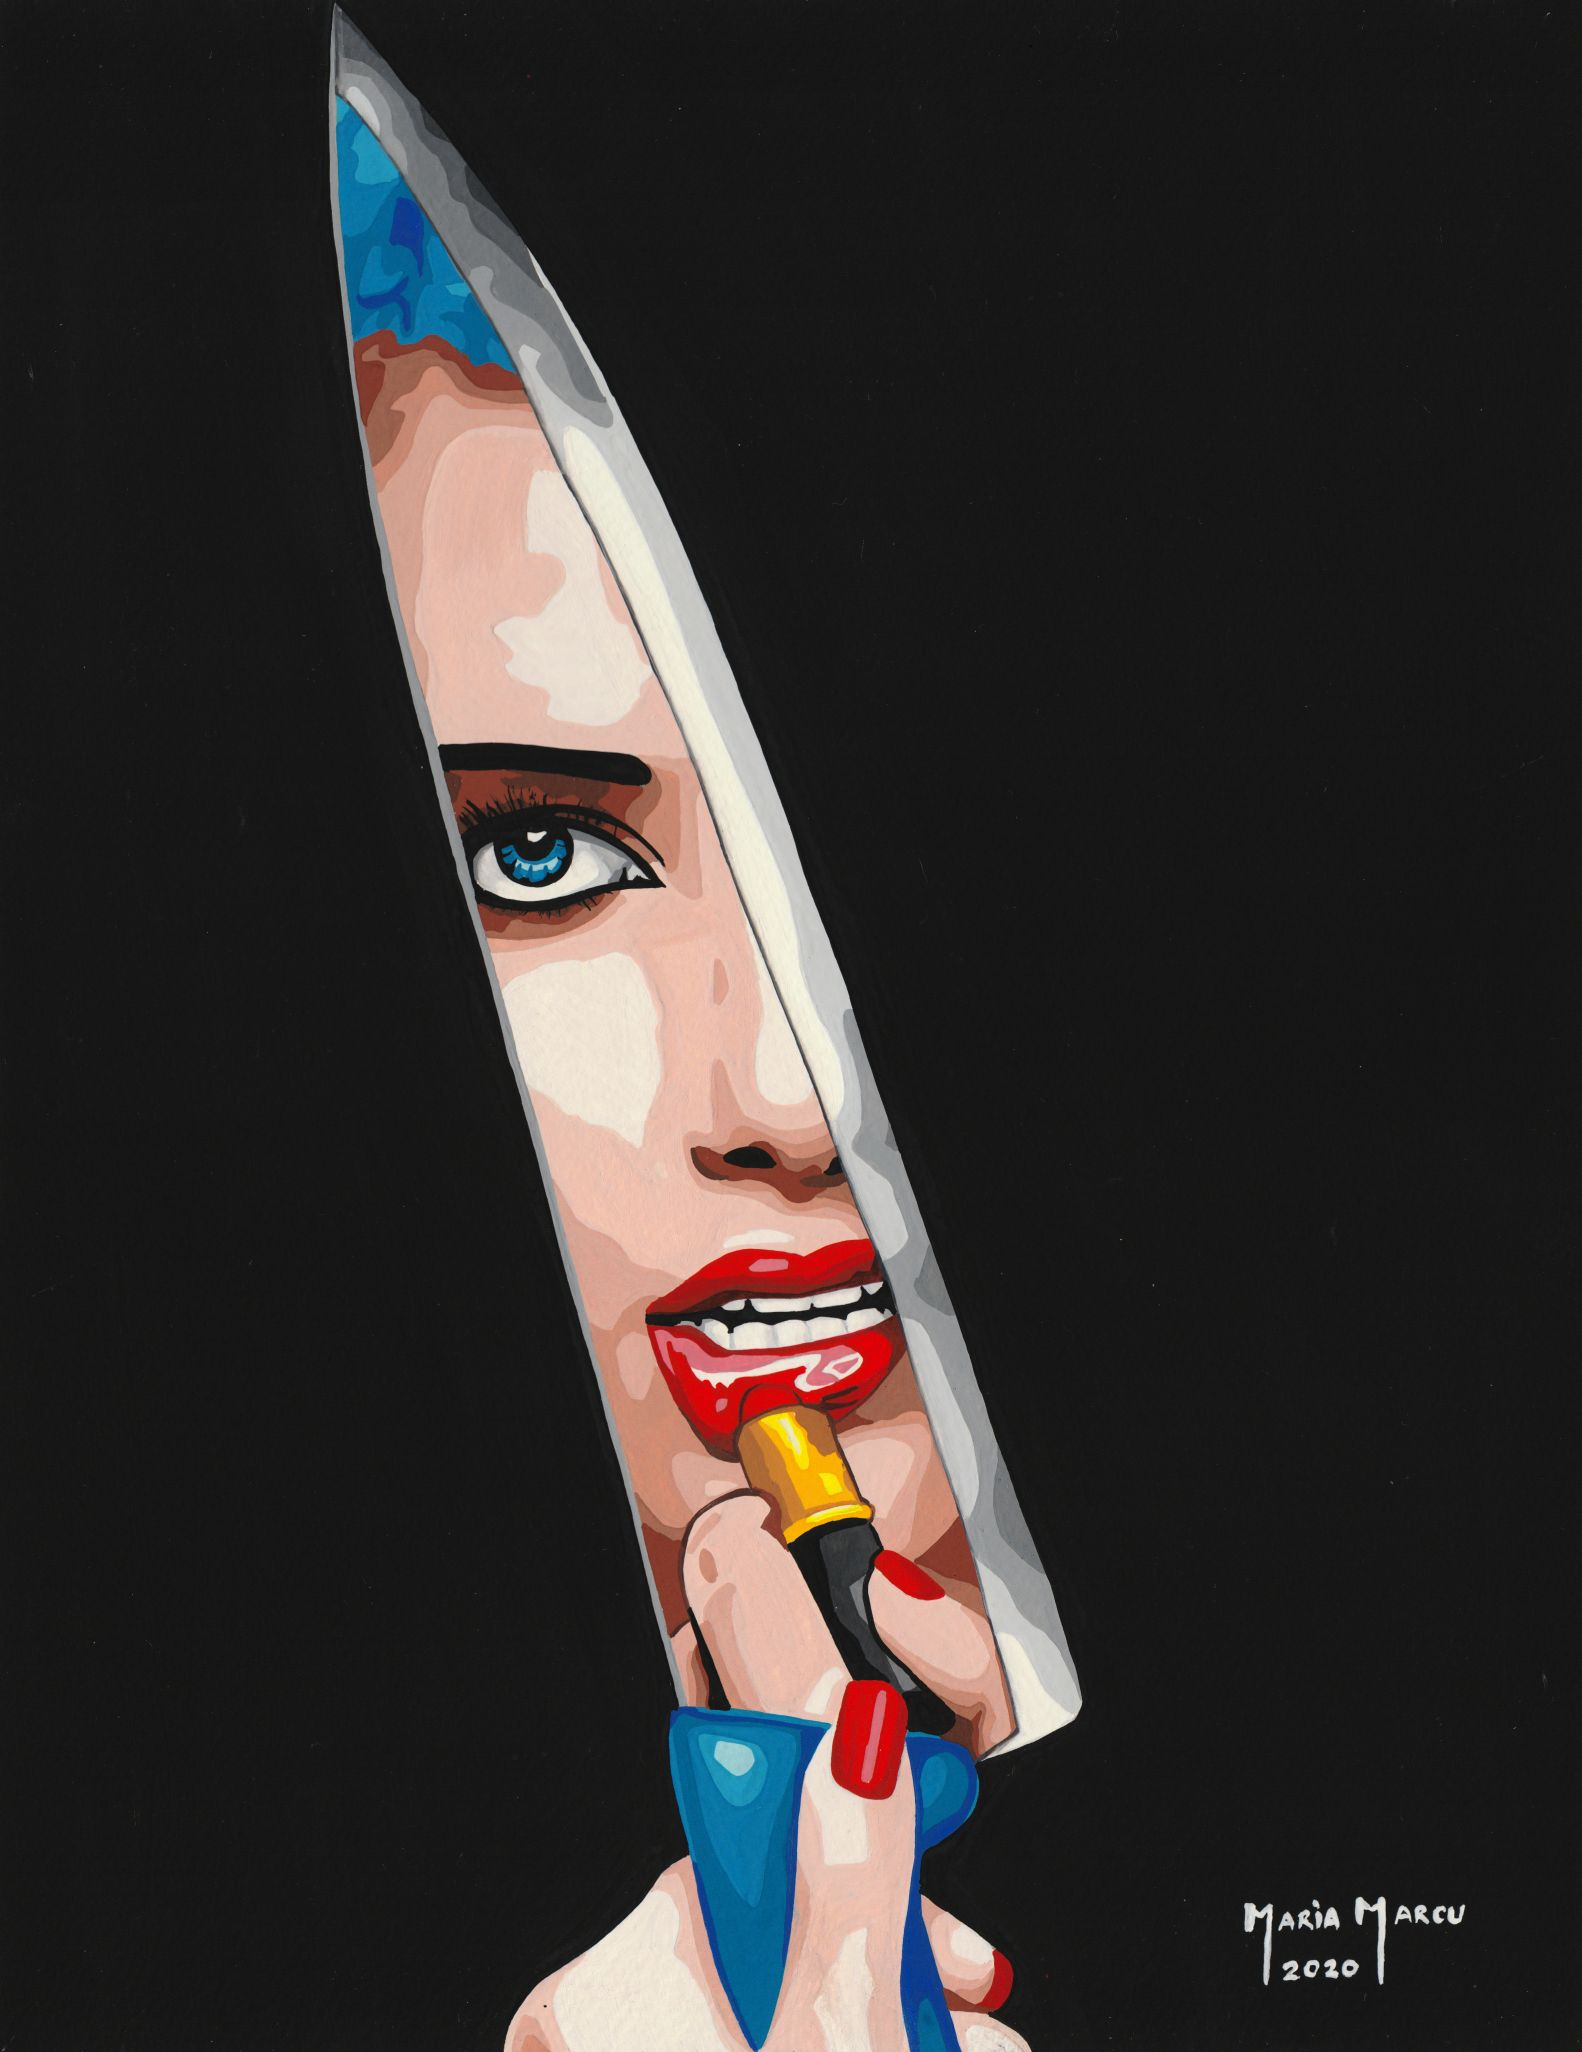 code-0057-beauty-blade-tempera-by-maria-marcu-popart-27-x-35-cm